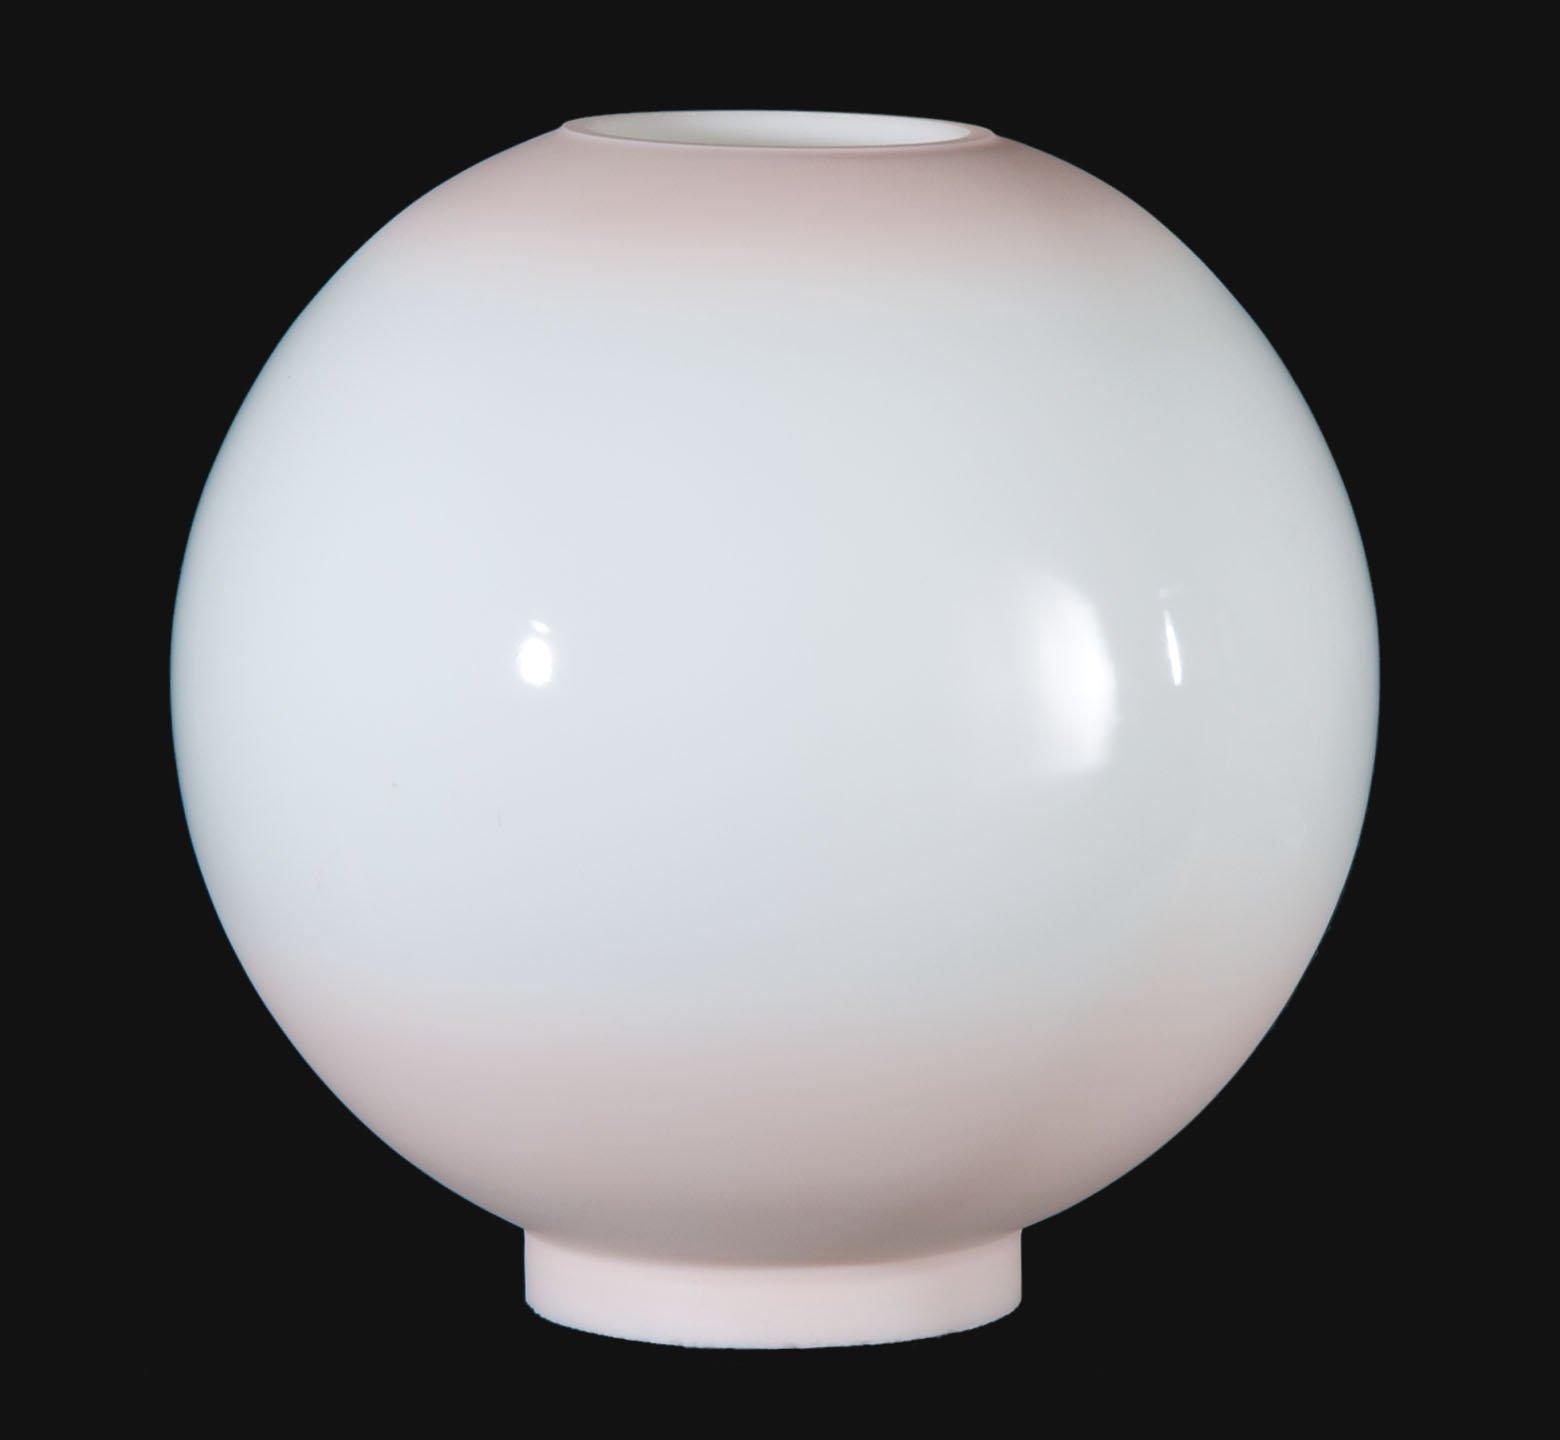 B&P Lamp 10'' Opal Glass Ball Shade, Pink Tint by B&P Lamp